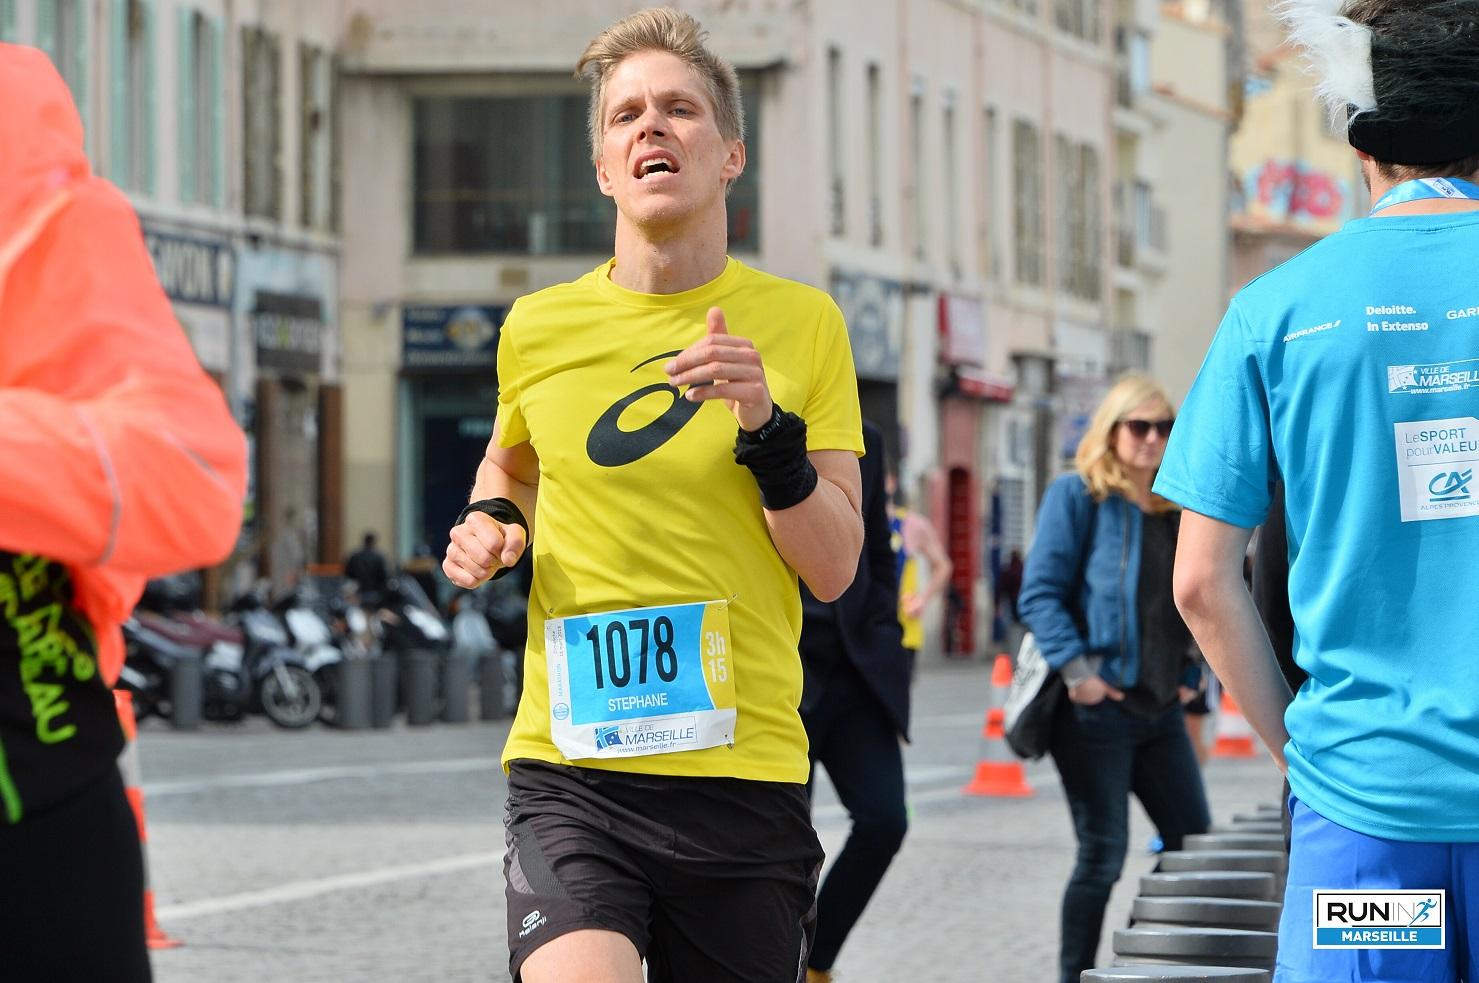 16-Je sprinte sur le dernier km